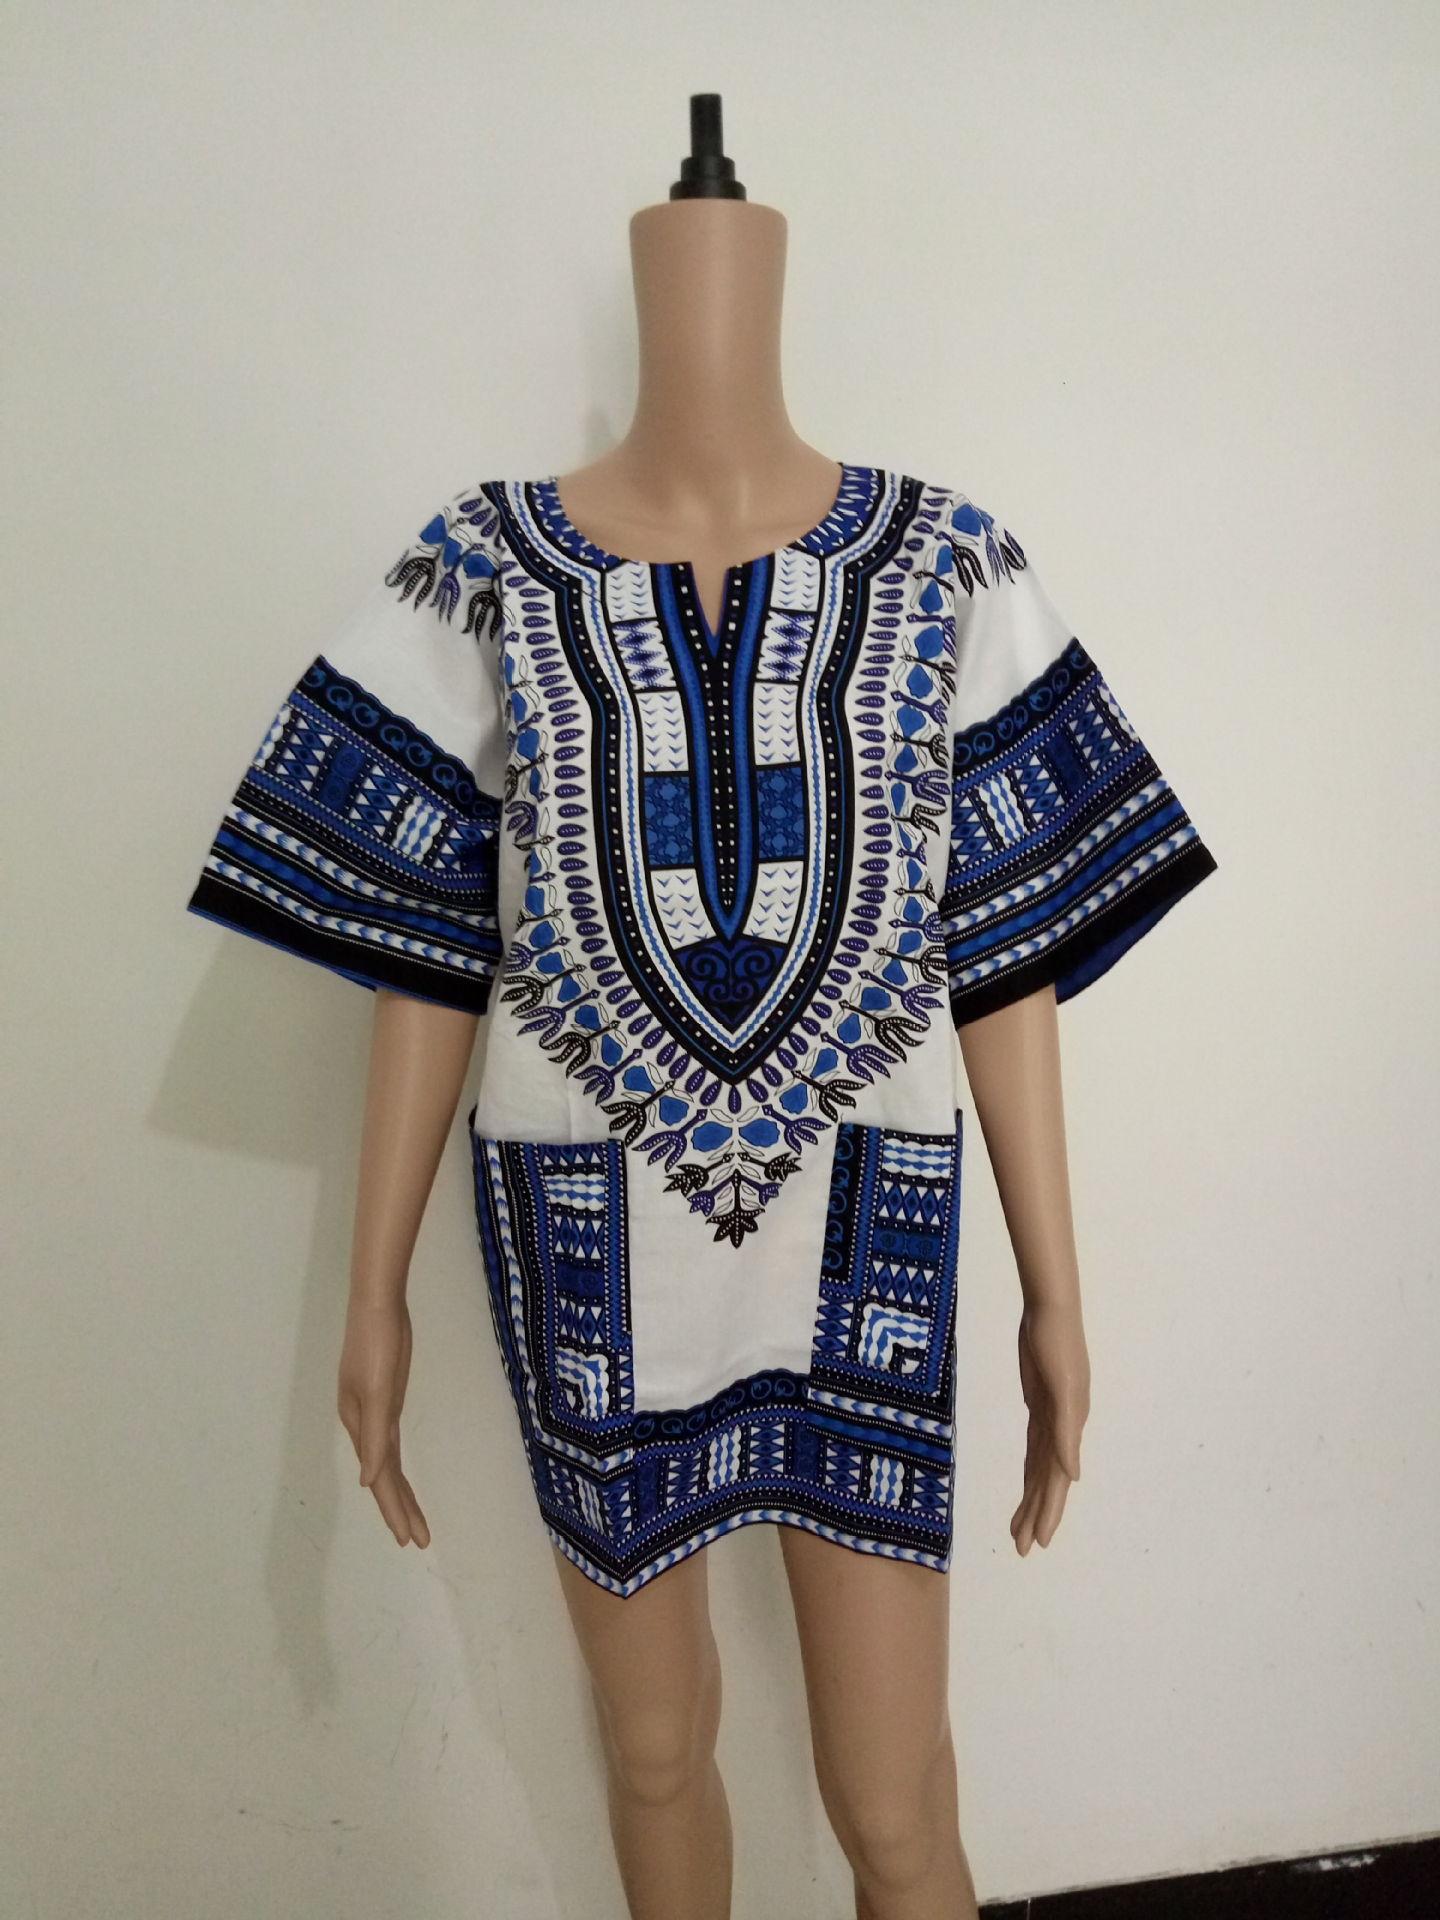 Vetement femme africain vestido listrado modeli afrikaine tradicional - Nacionalna odjeća - Foto 2